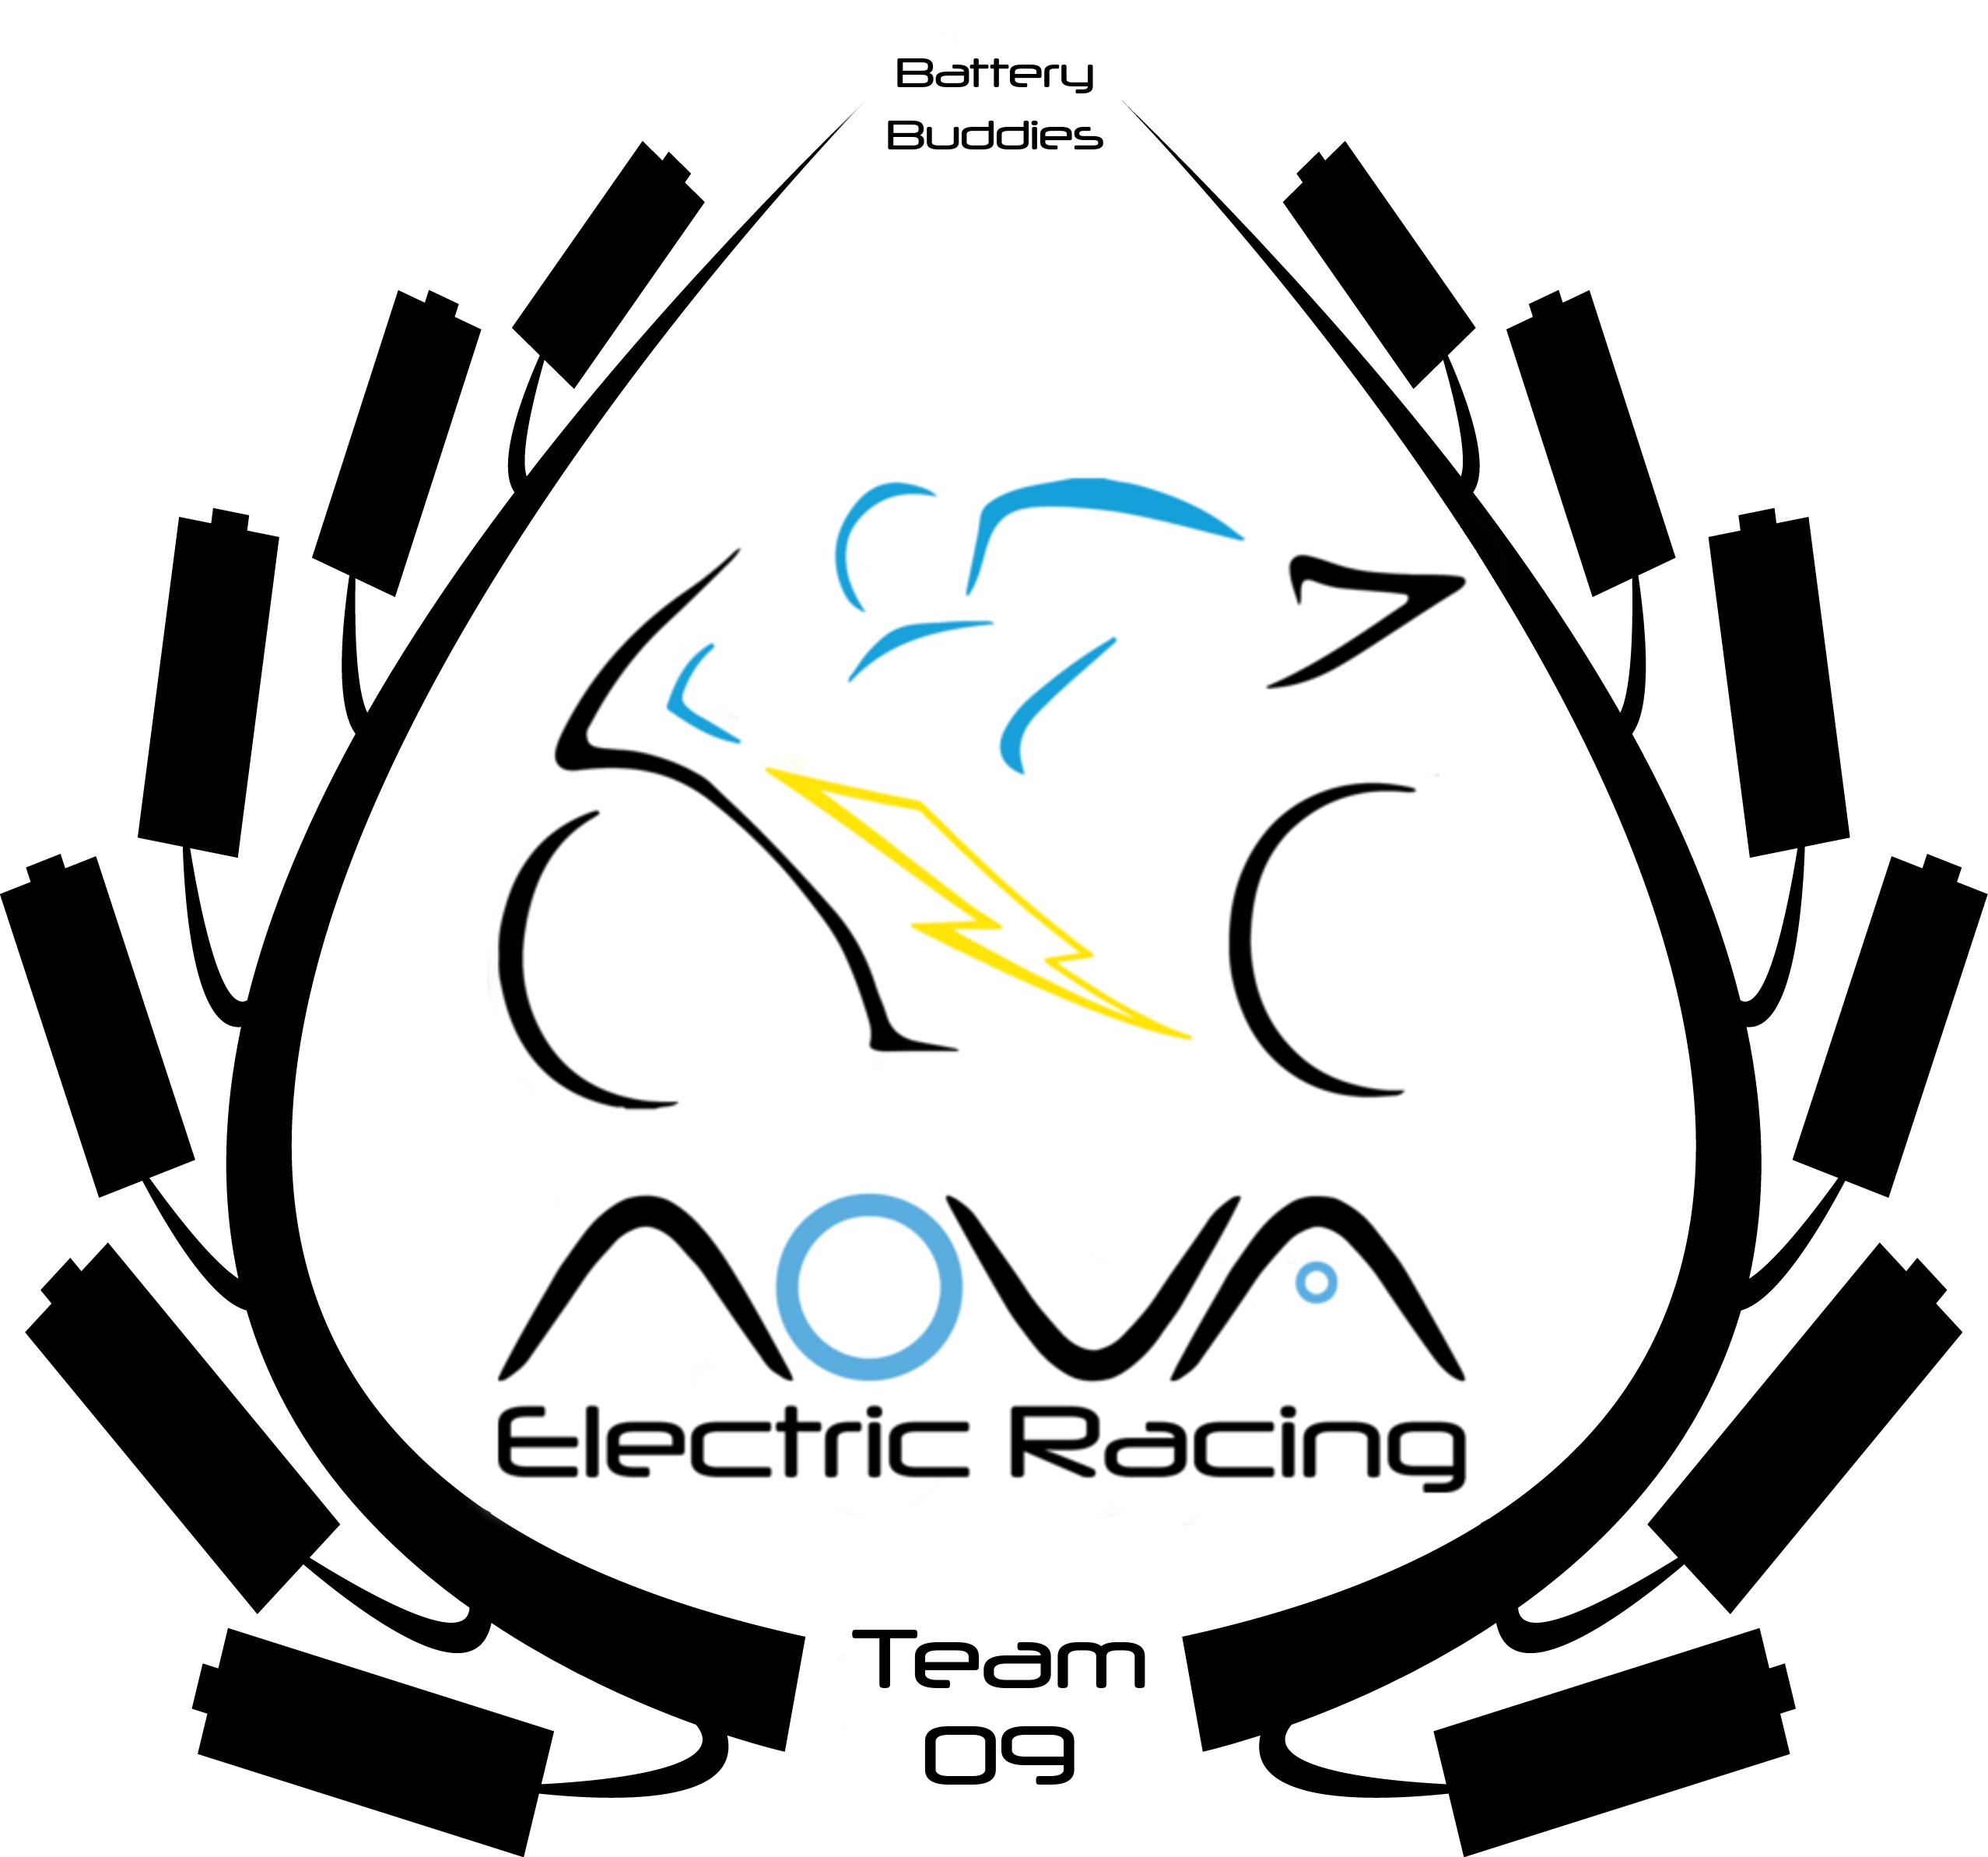 2555x2386 Battery Buddies Nova Electric Racing